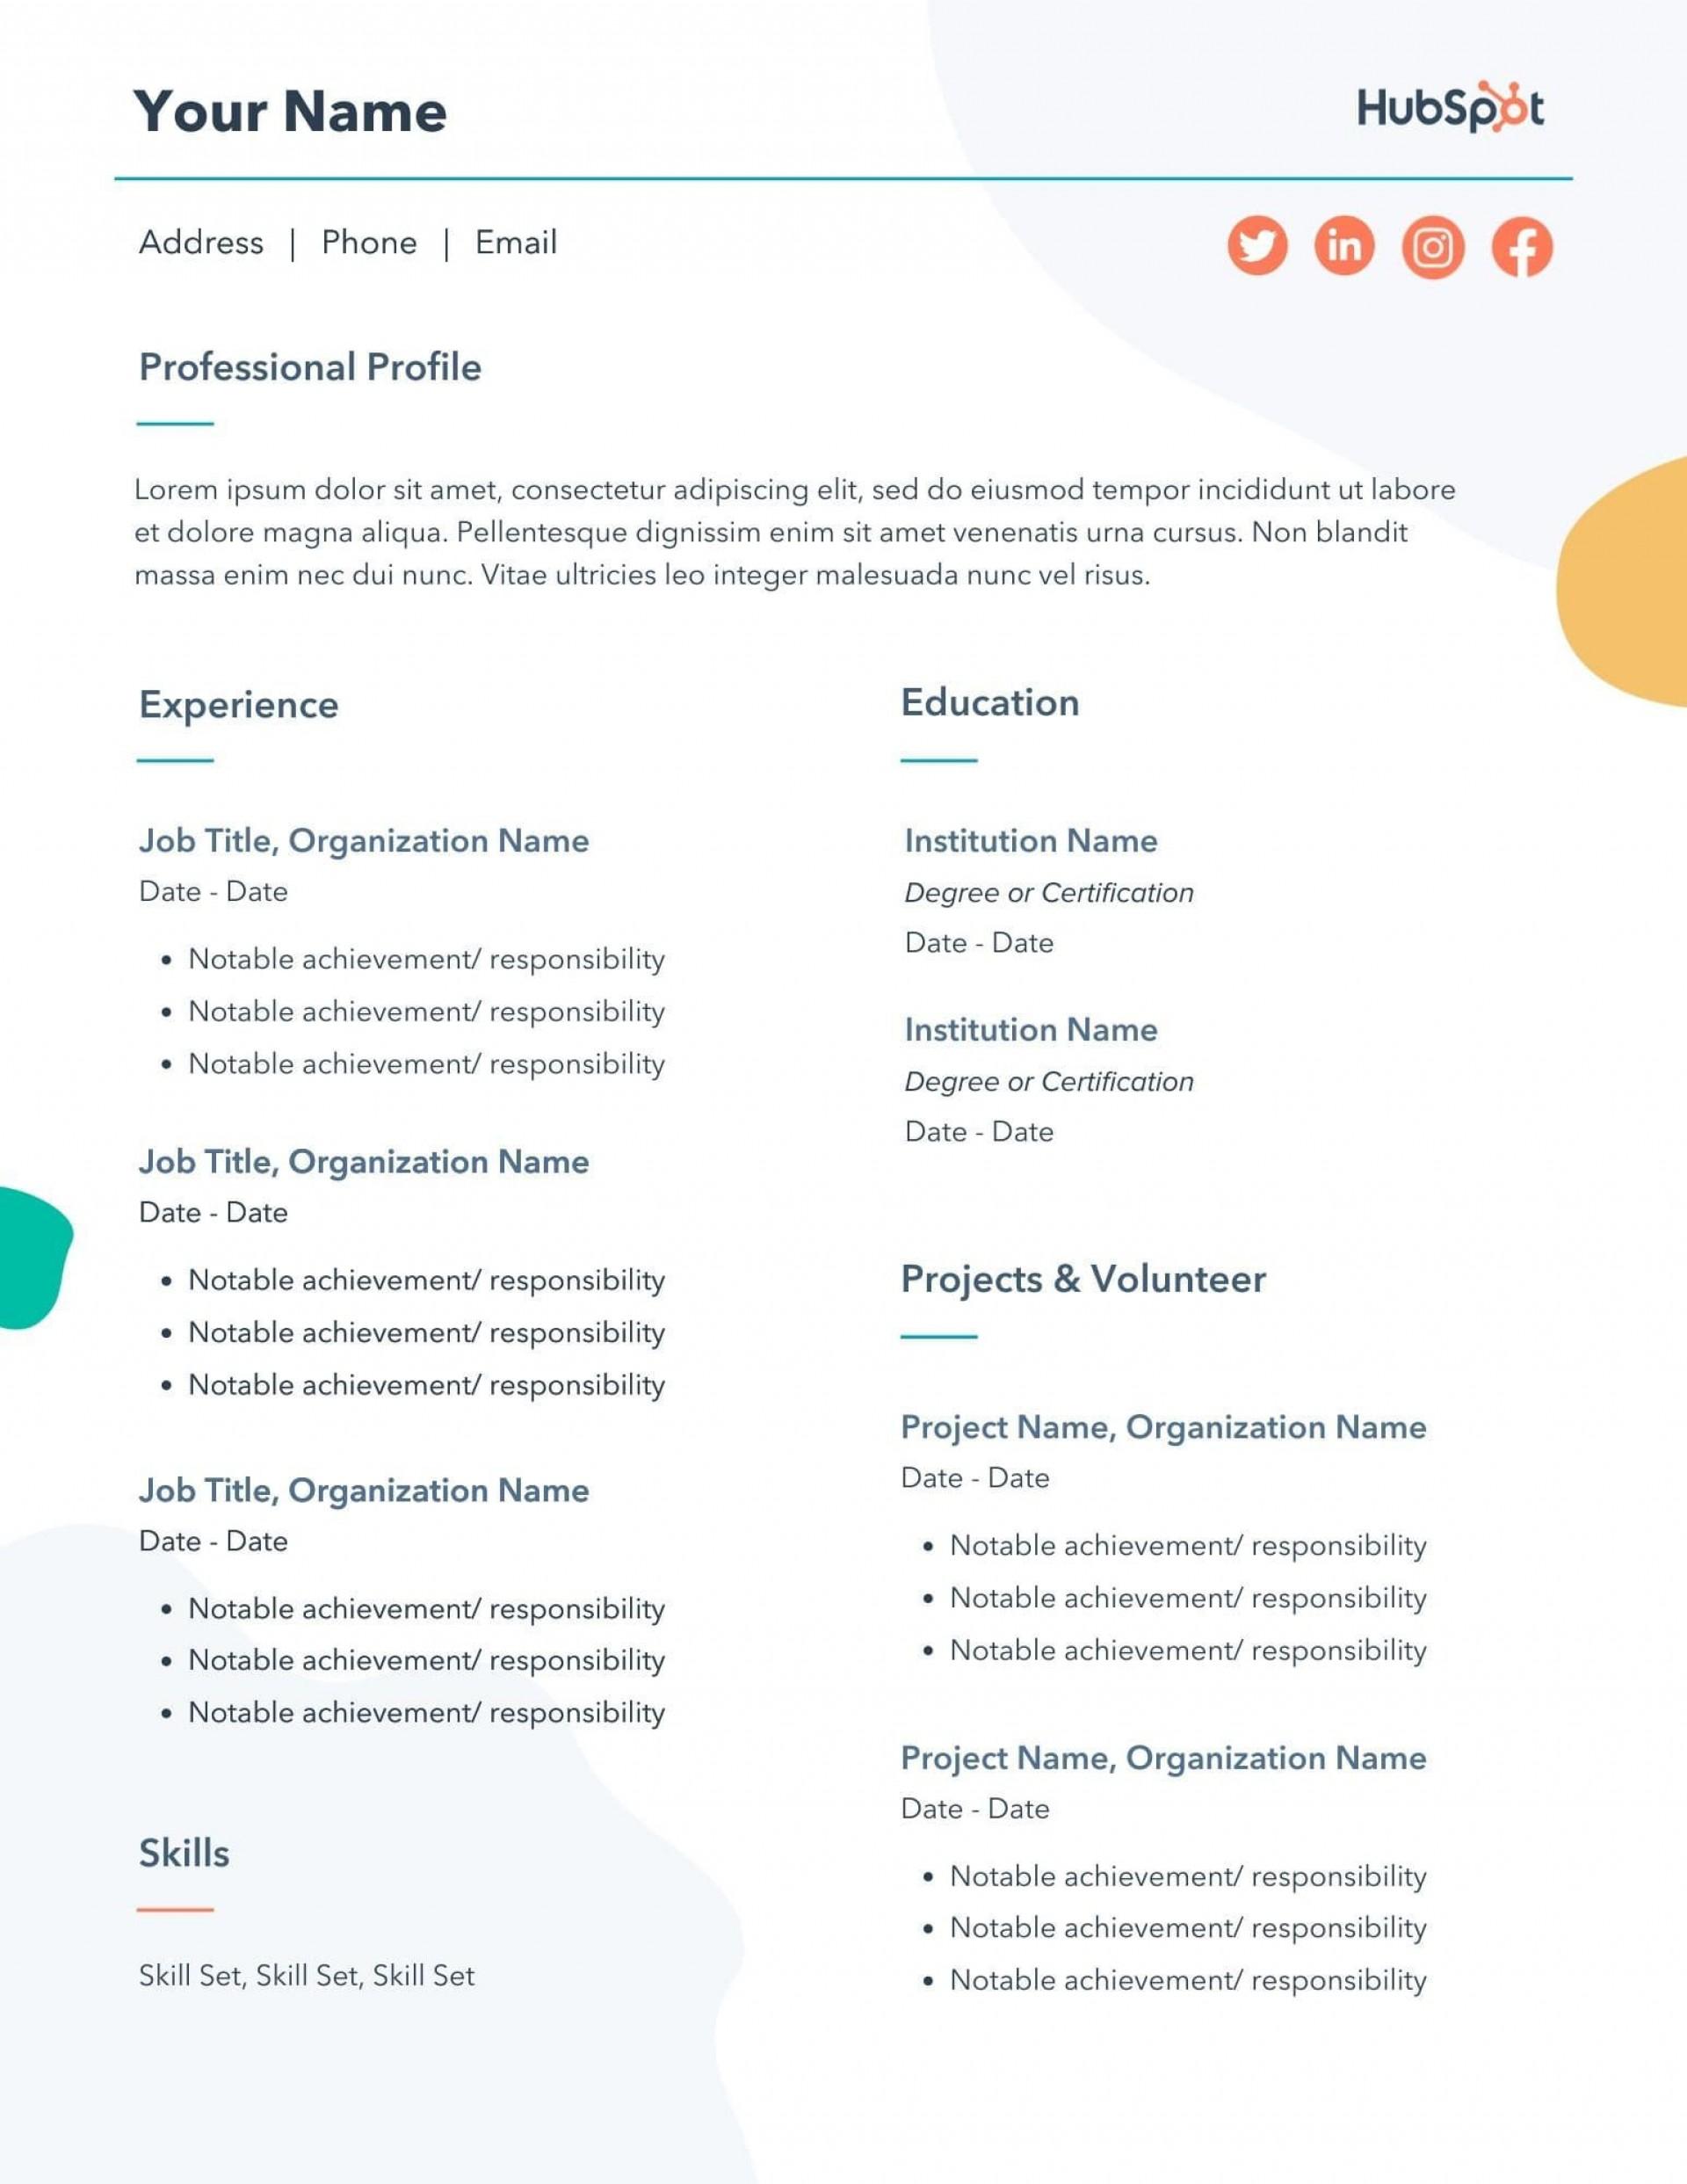 008 Impressive How To Create A Resume Template In Microsoft Word Idea  Cv/resume Docx1920